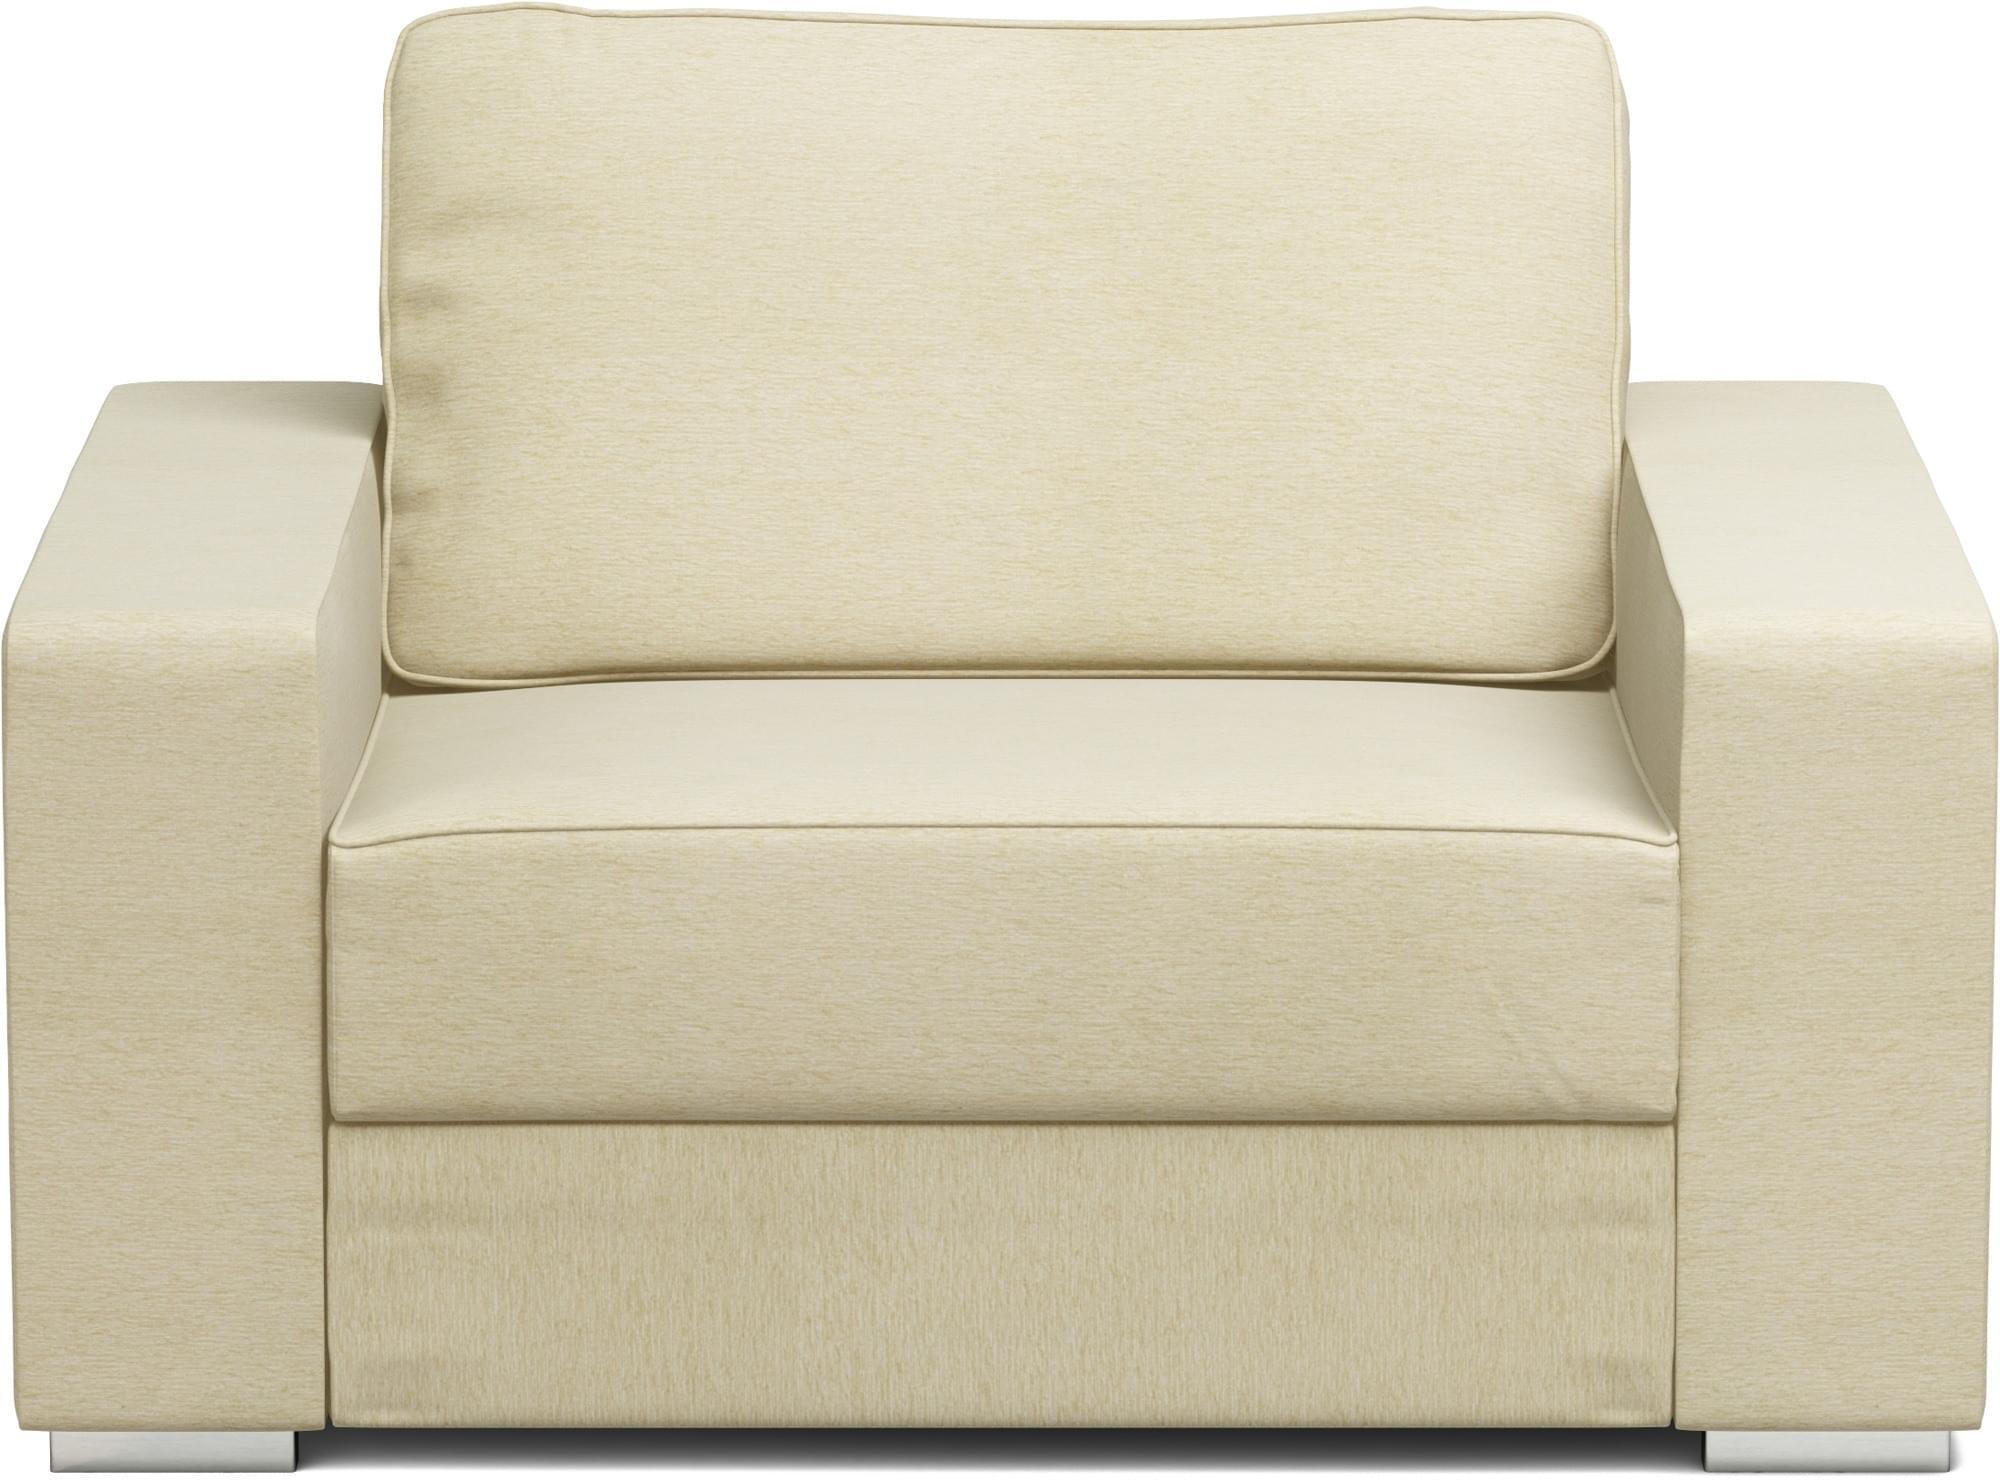 Sui Armchair Bed - Big Armchair Bed   Nabru